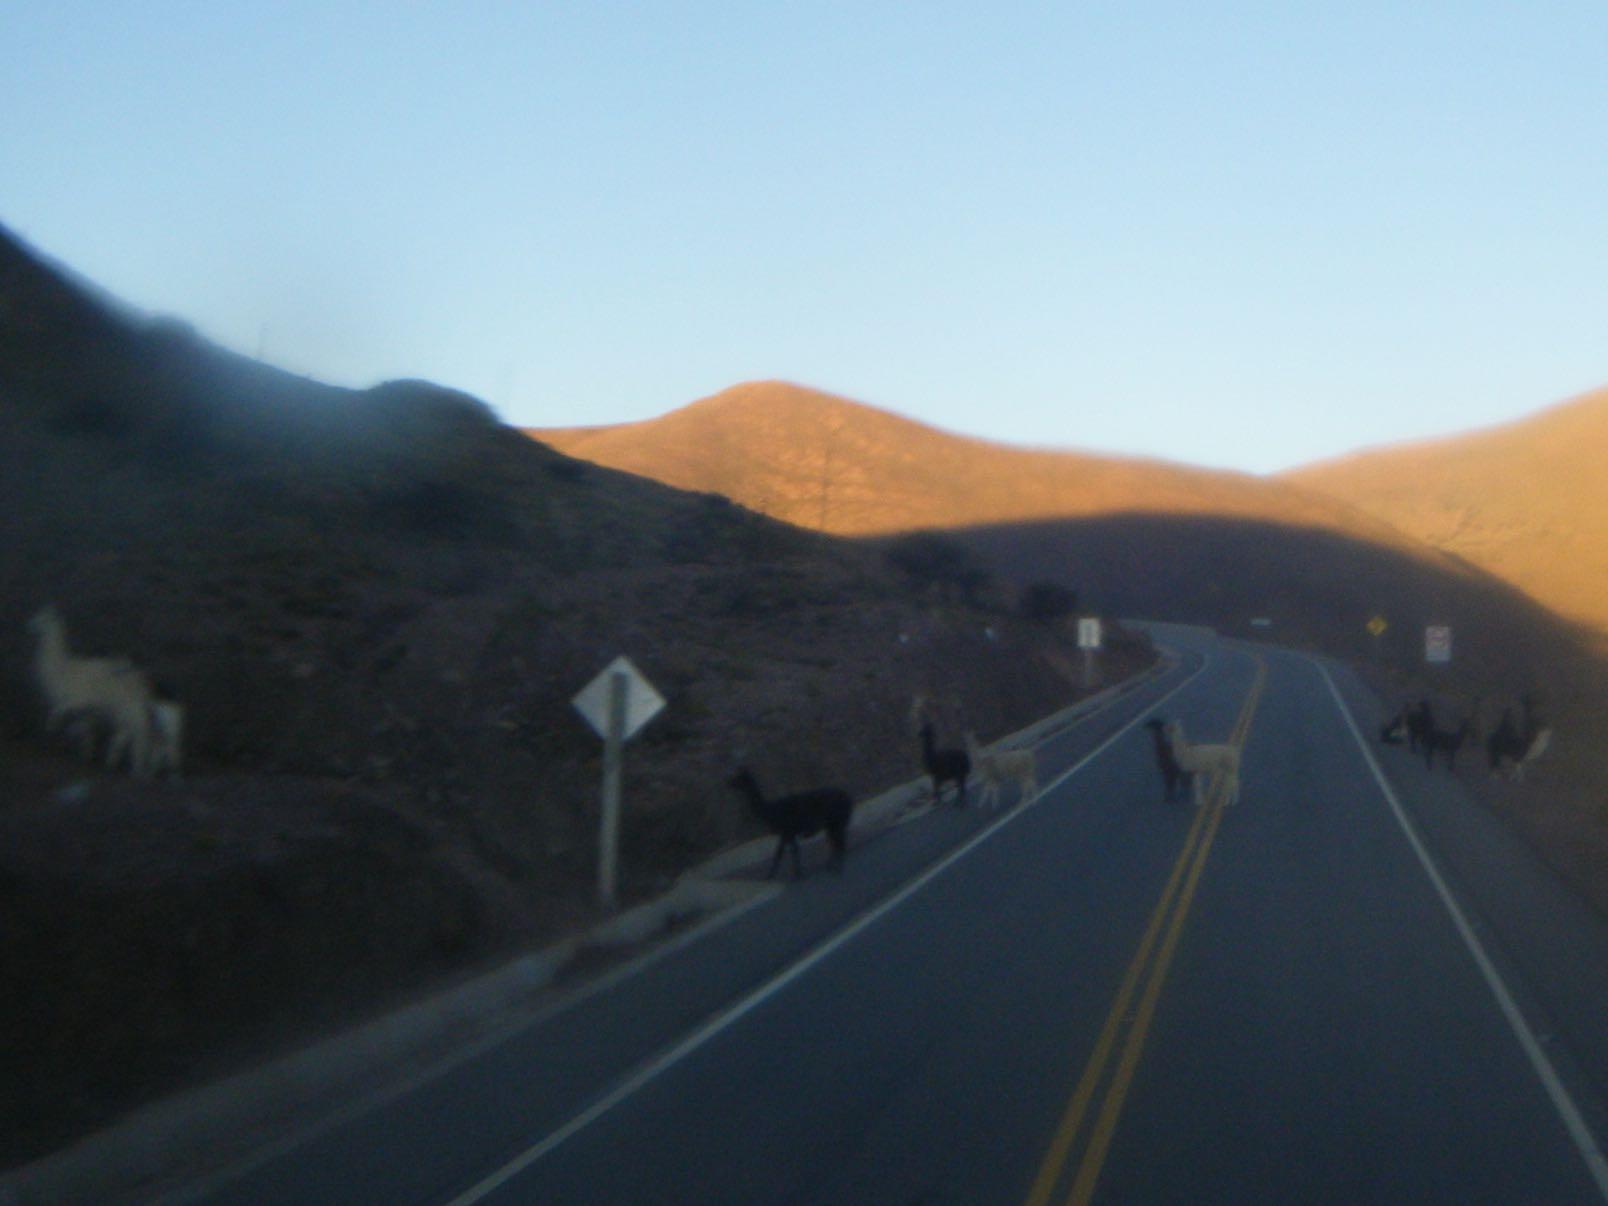 alpaca and llama on the road